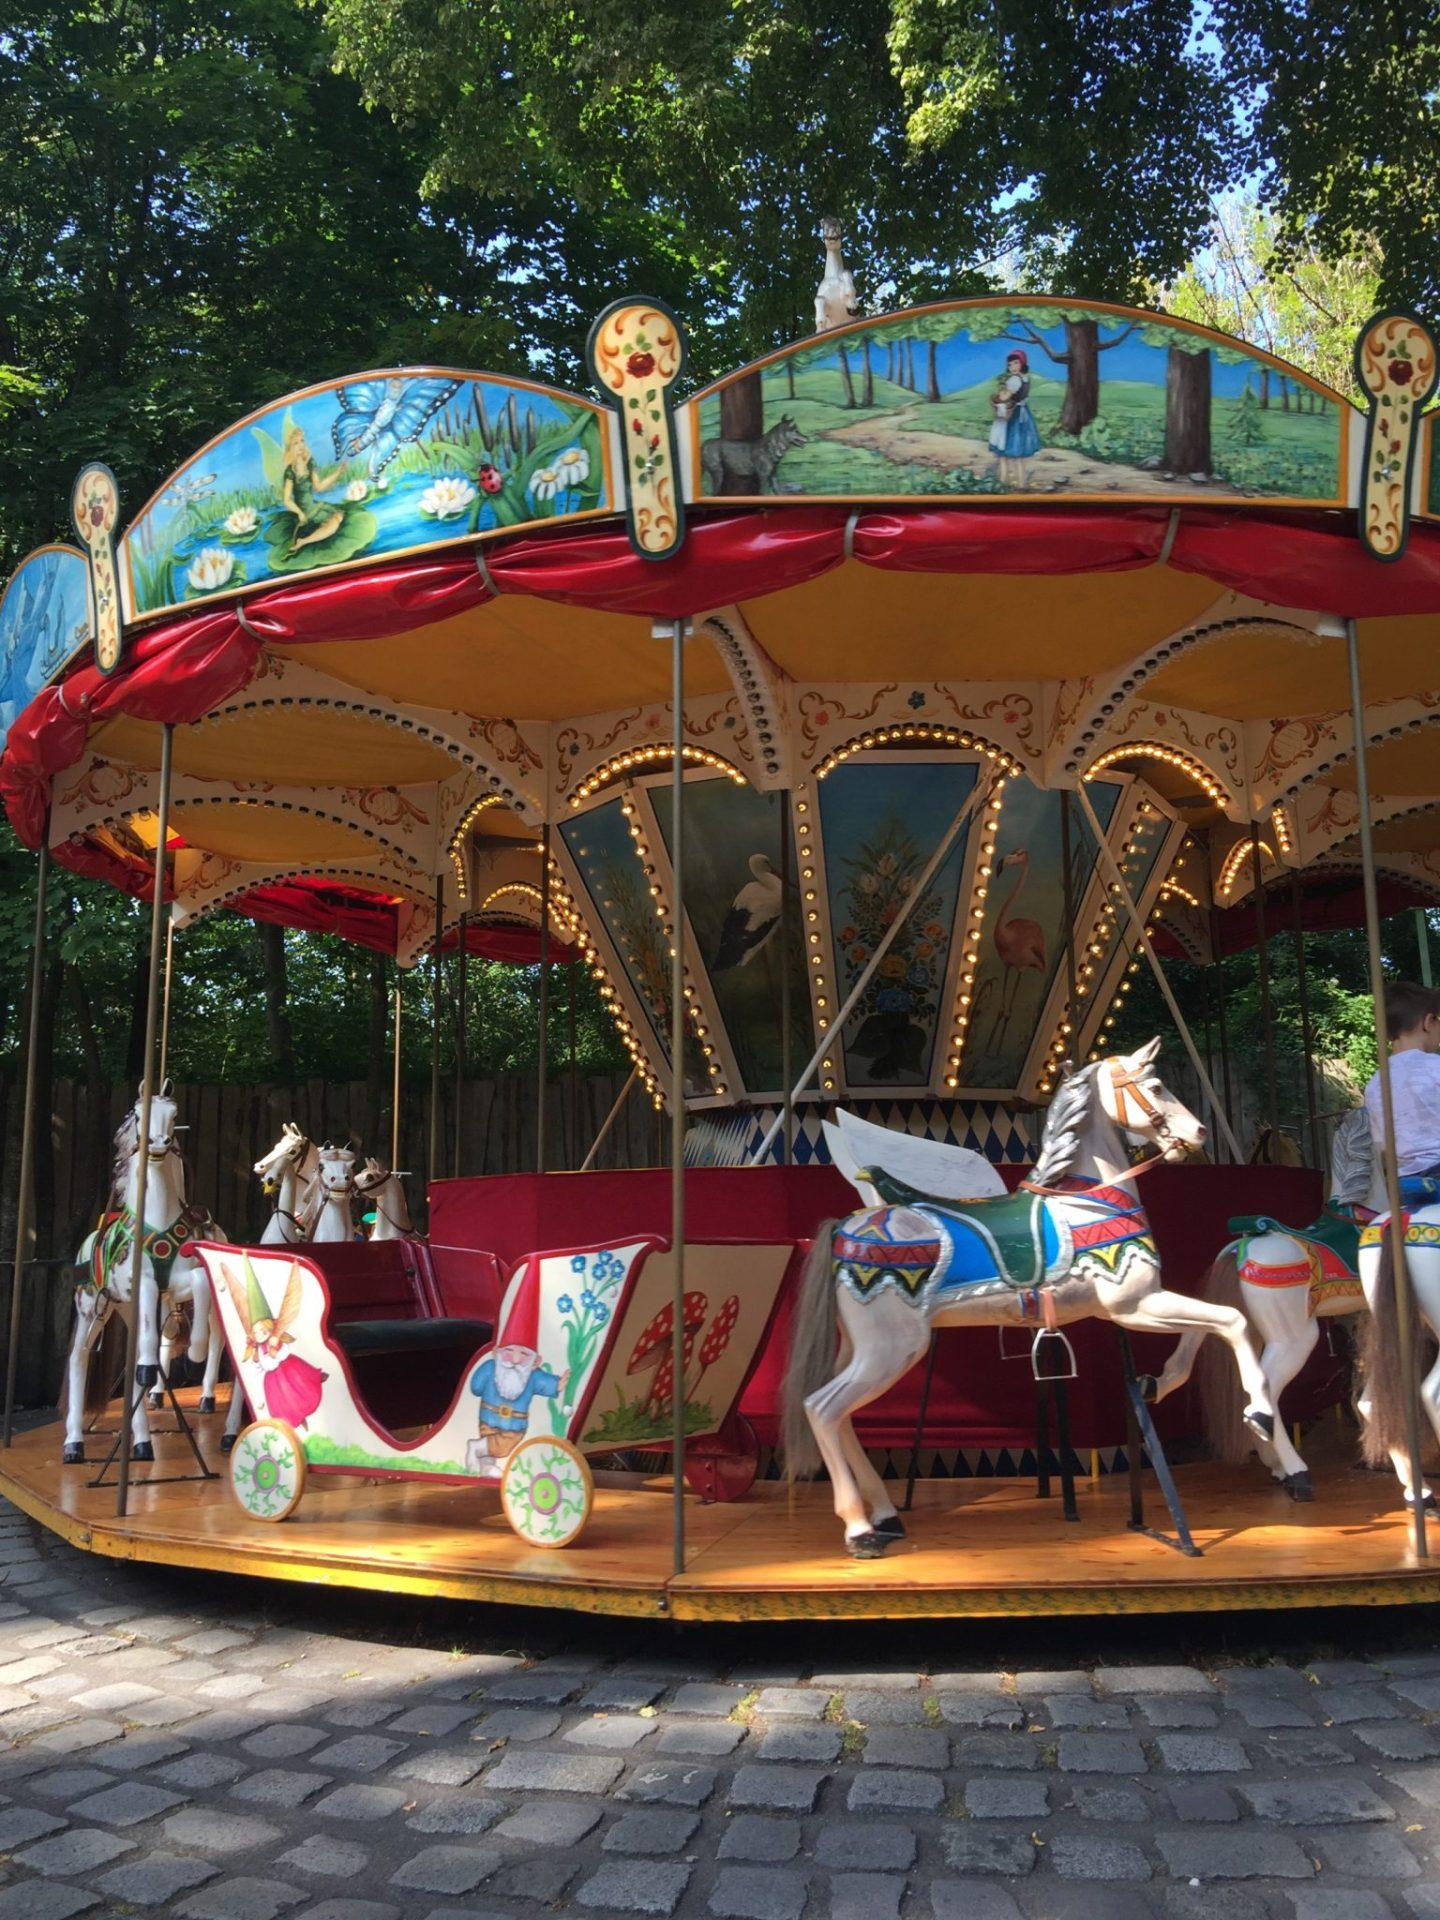 Carousel in the Hellabrunn Zoo